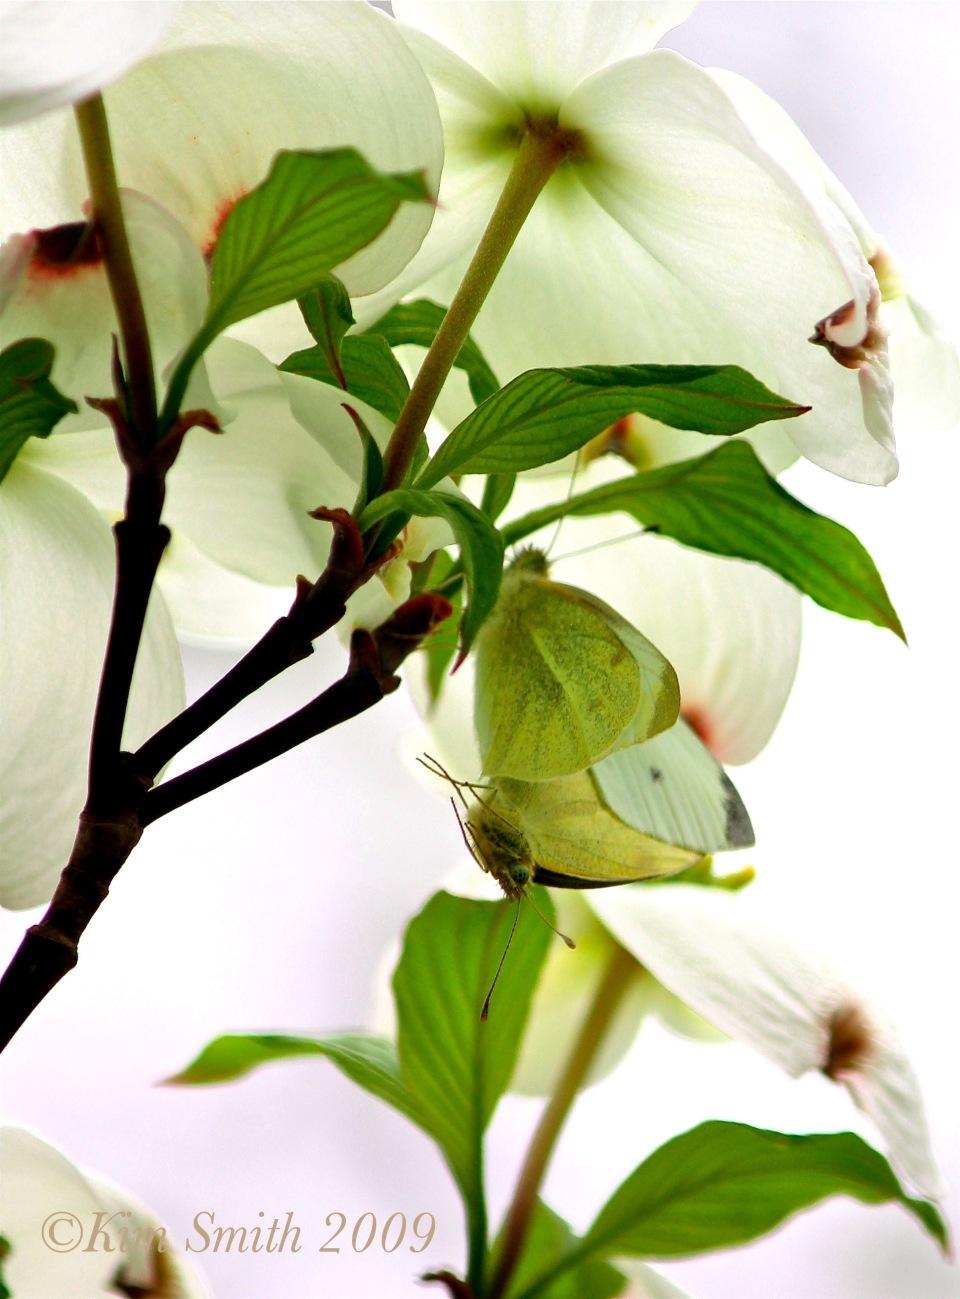 Cabbage White Butterflies mating in Cornus florida ©Kim Smith 2009